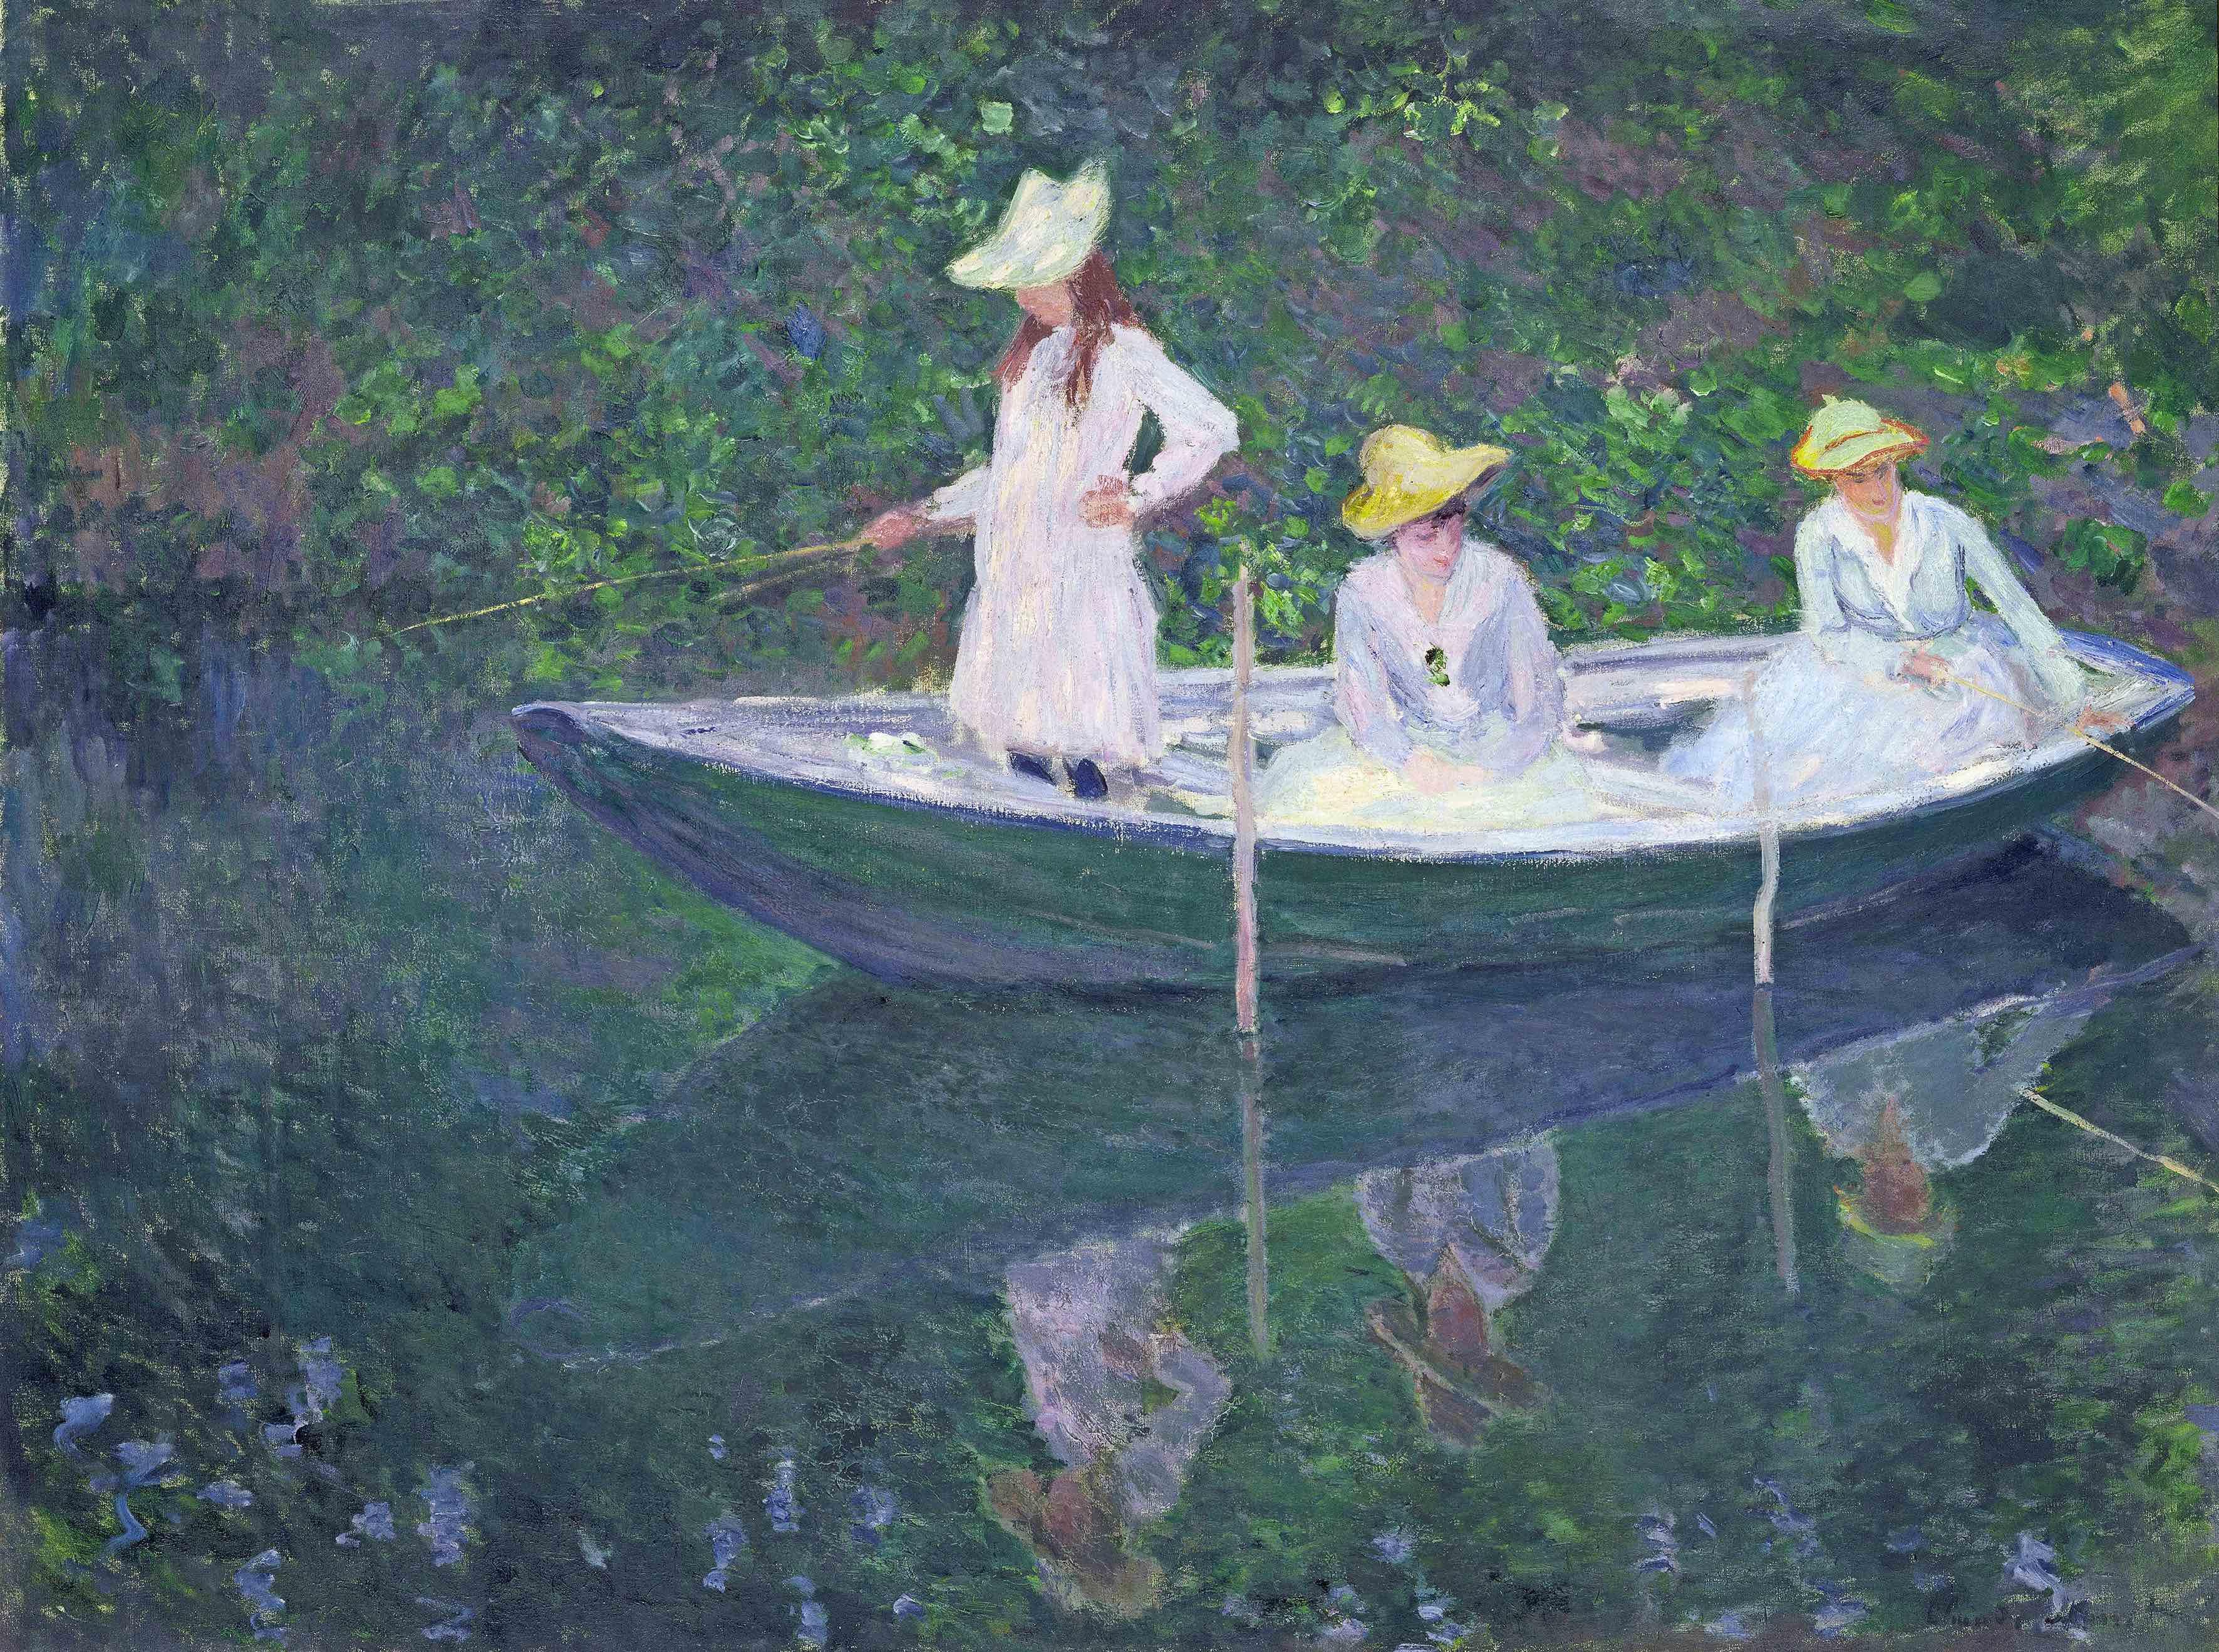 Monet, Fondation Beyeler, Basel, Basilea, Mostra, Musée d'Orsay